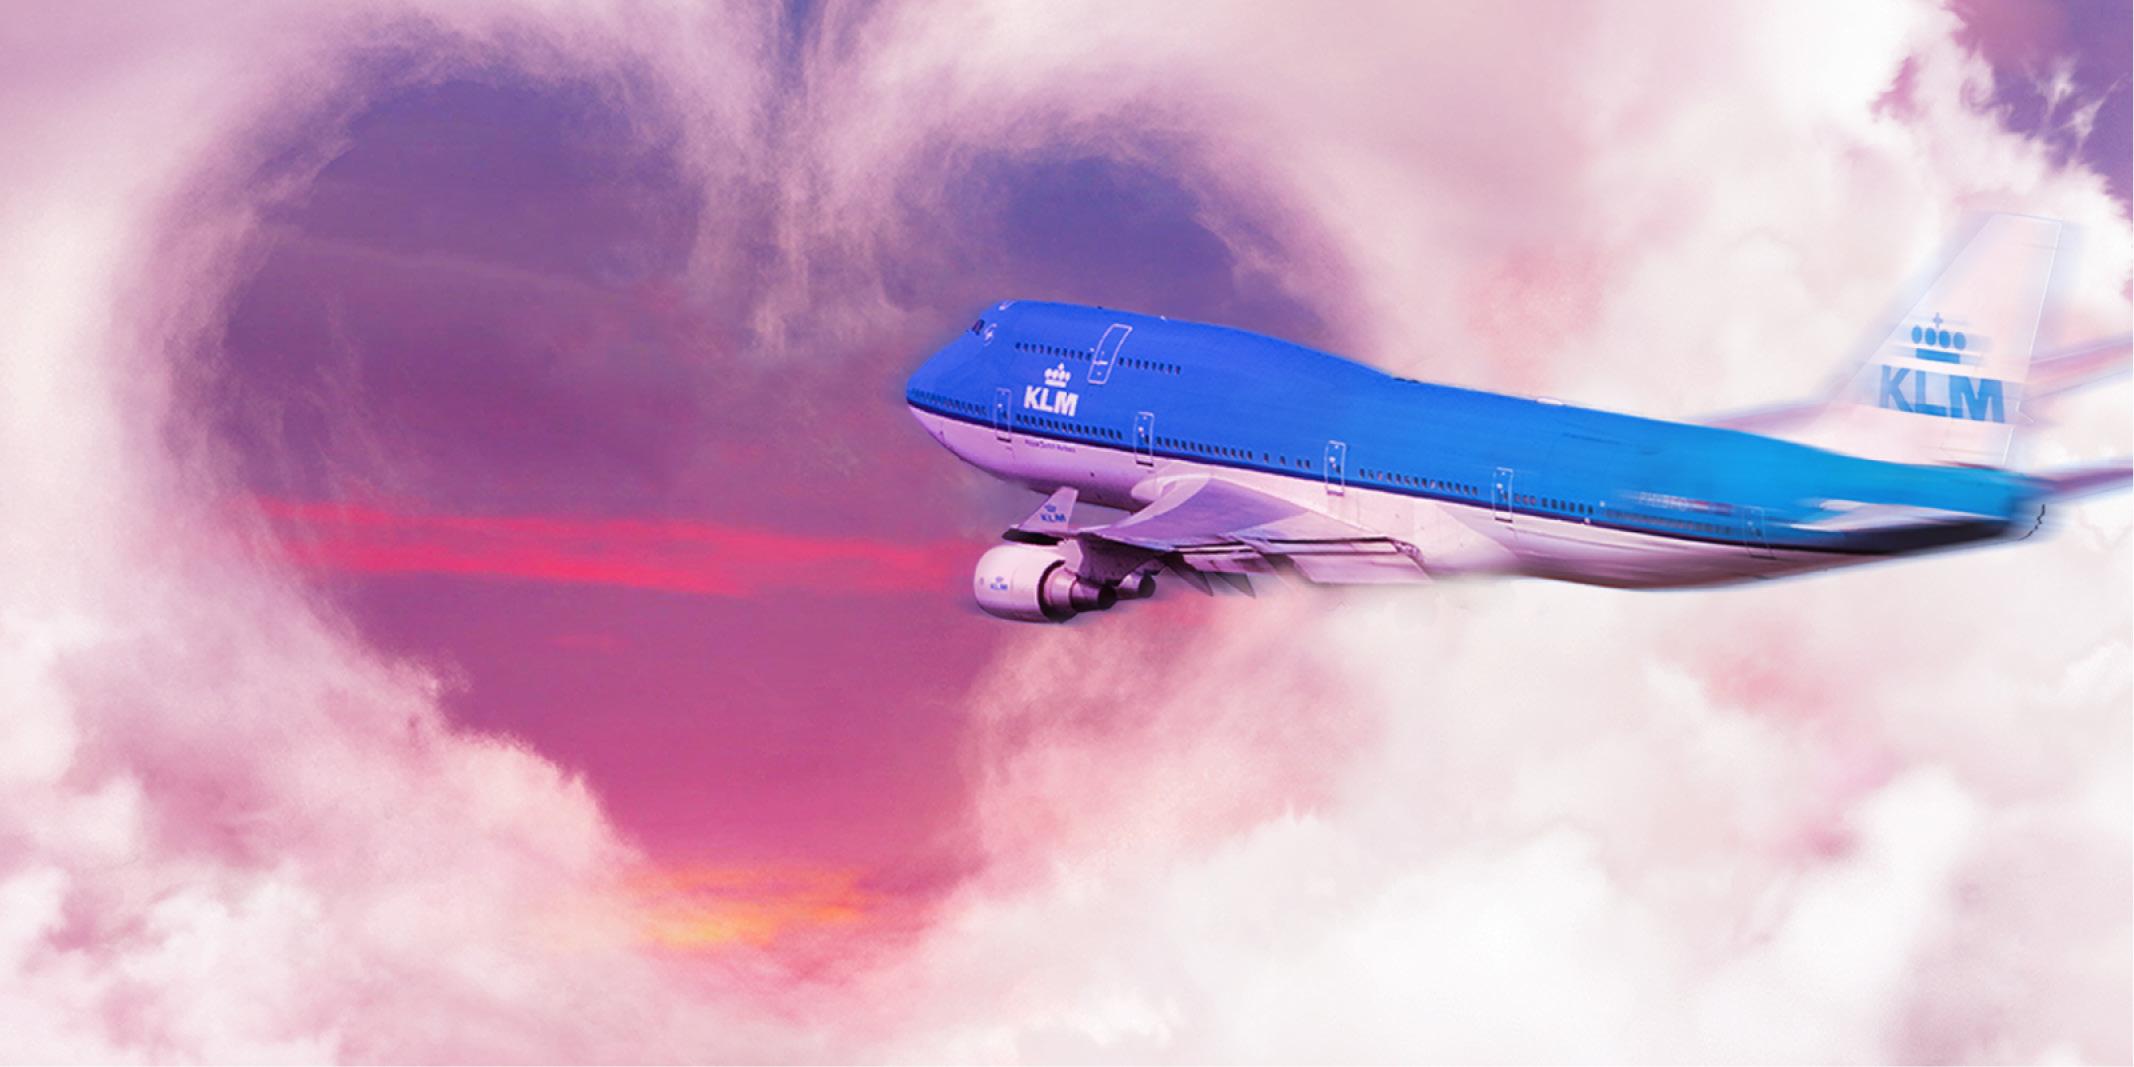 slider_paradisefm_KLM_valentijnsactie2017